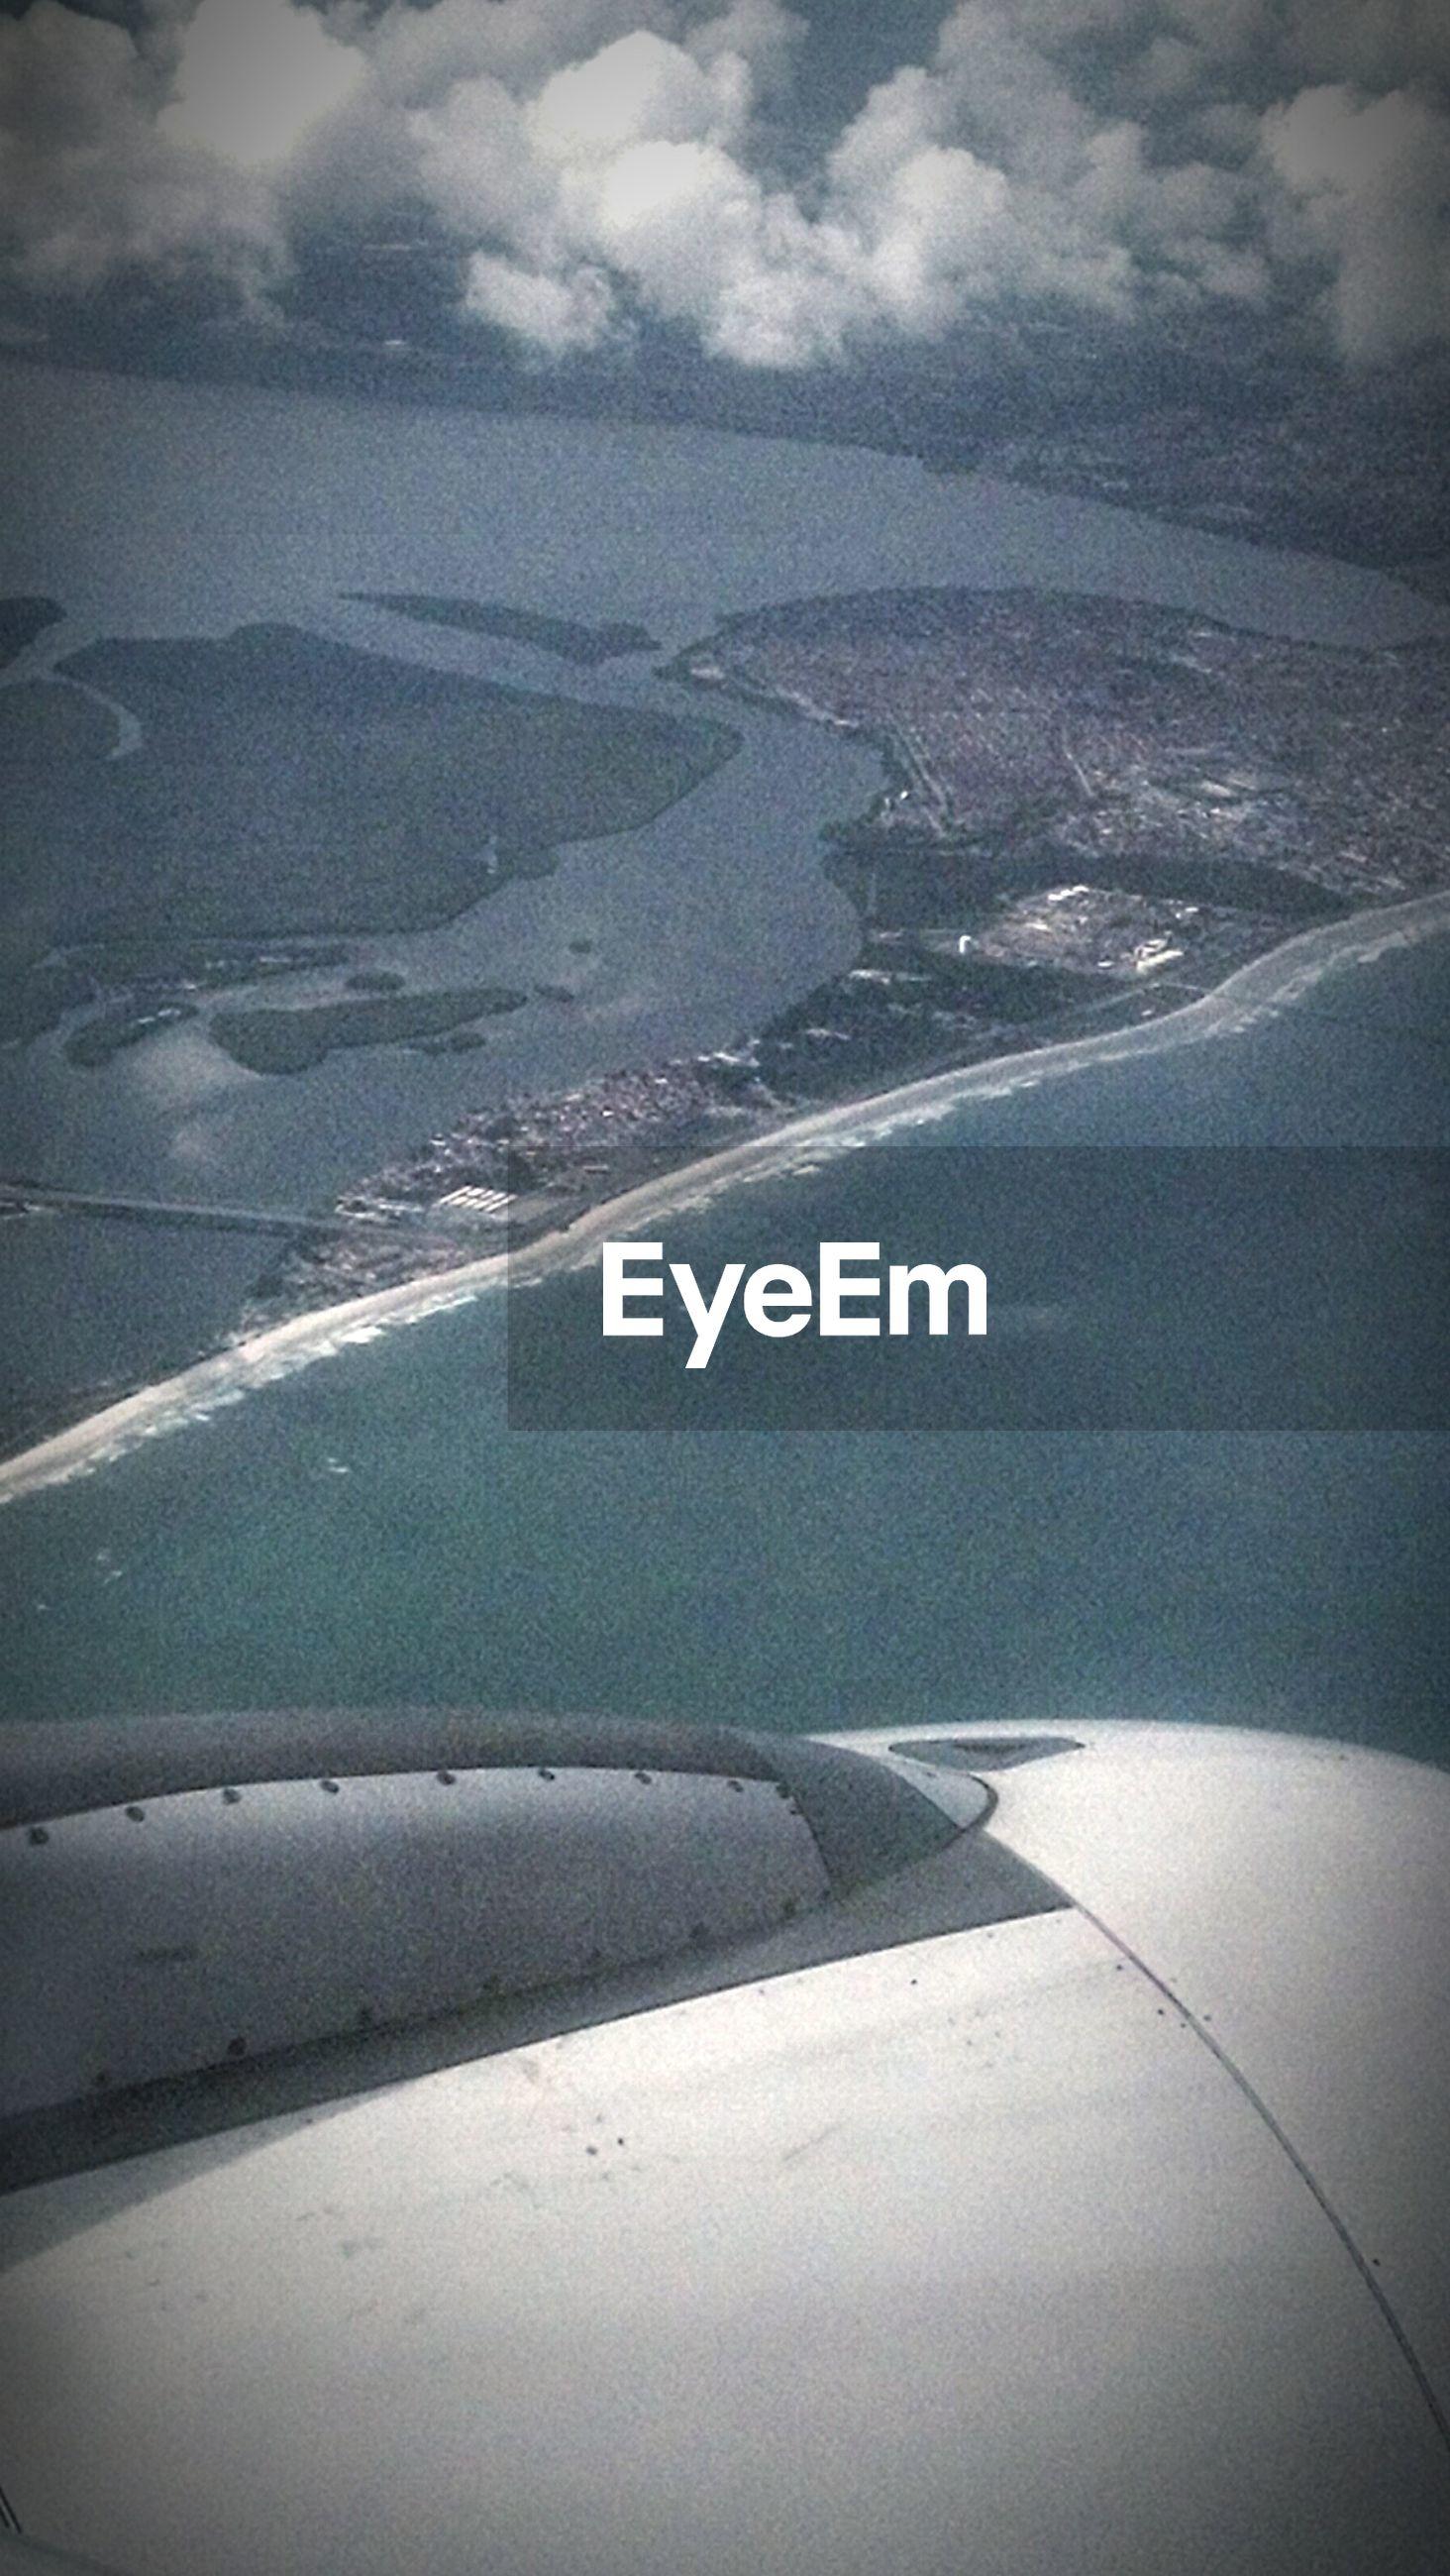 Landscape seen through airplane